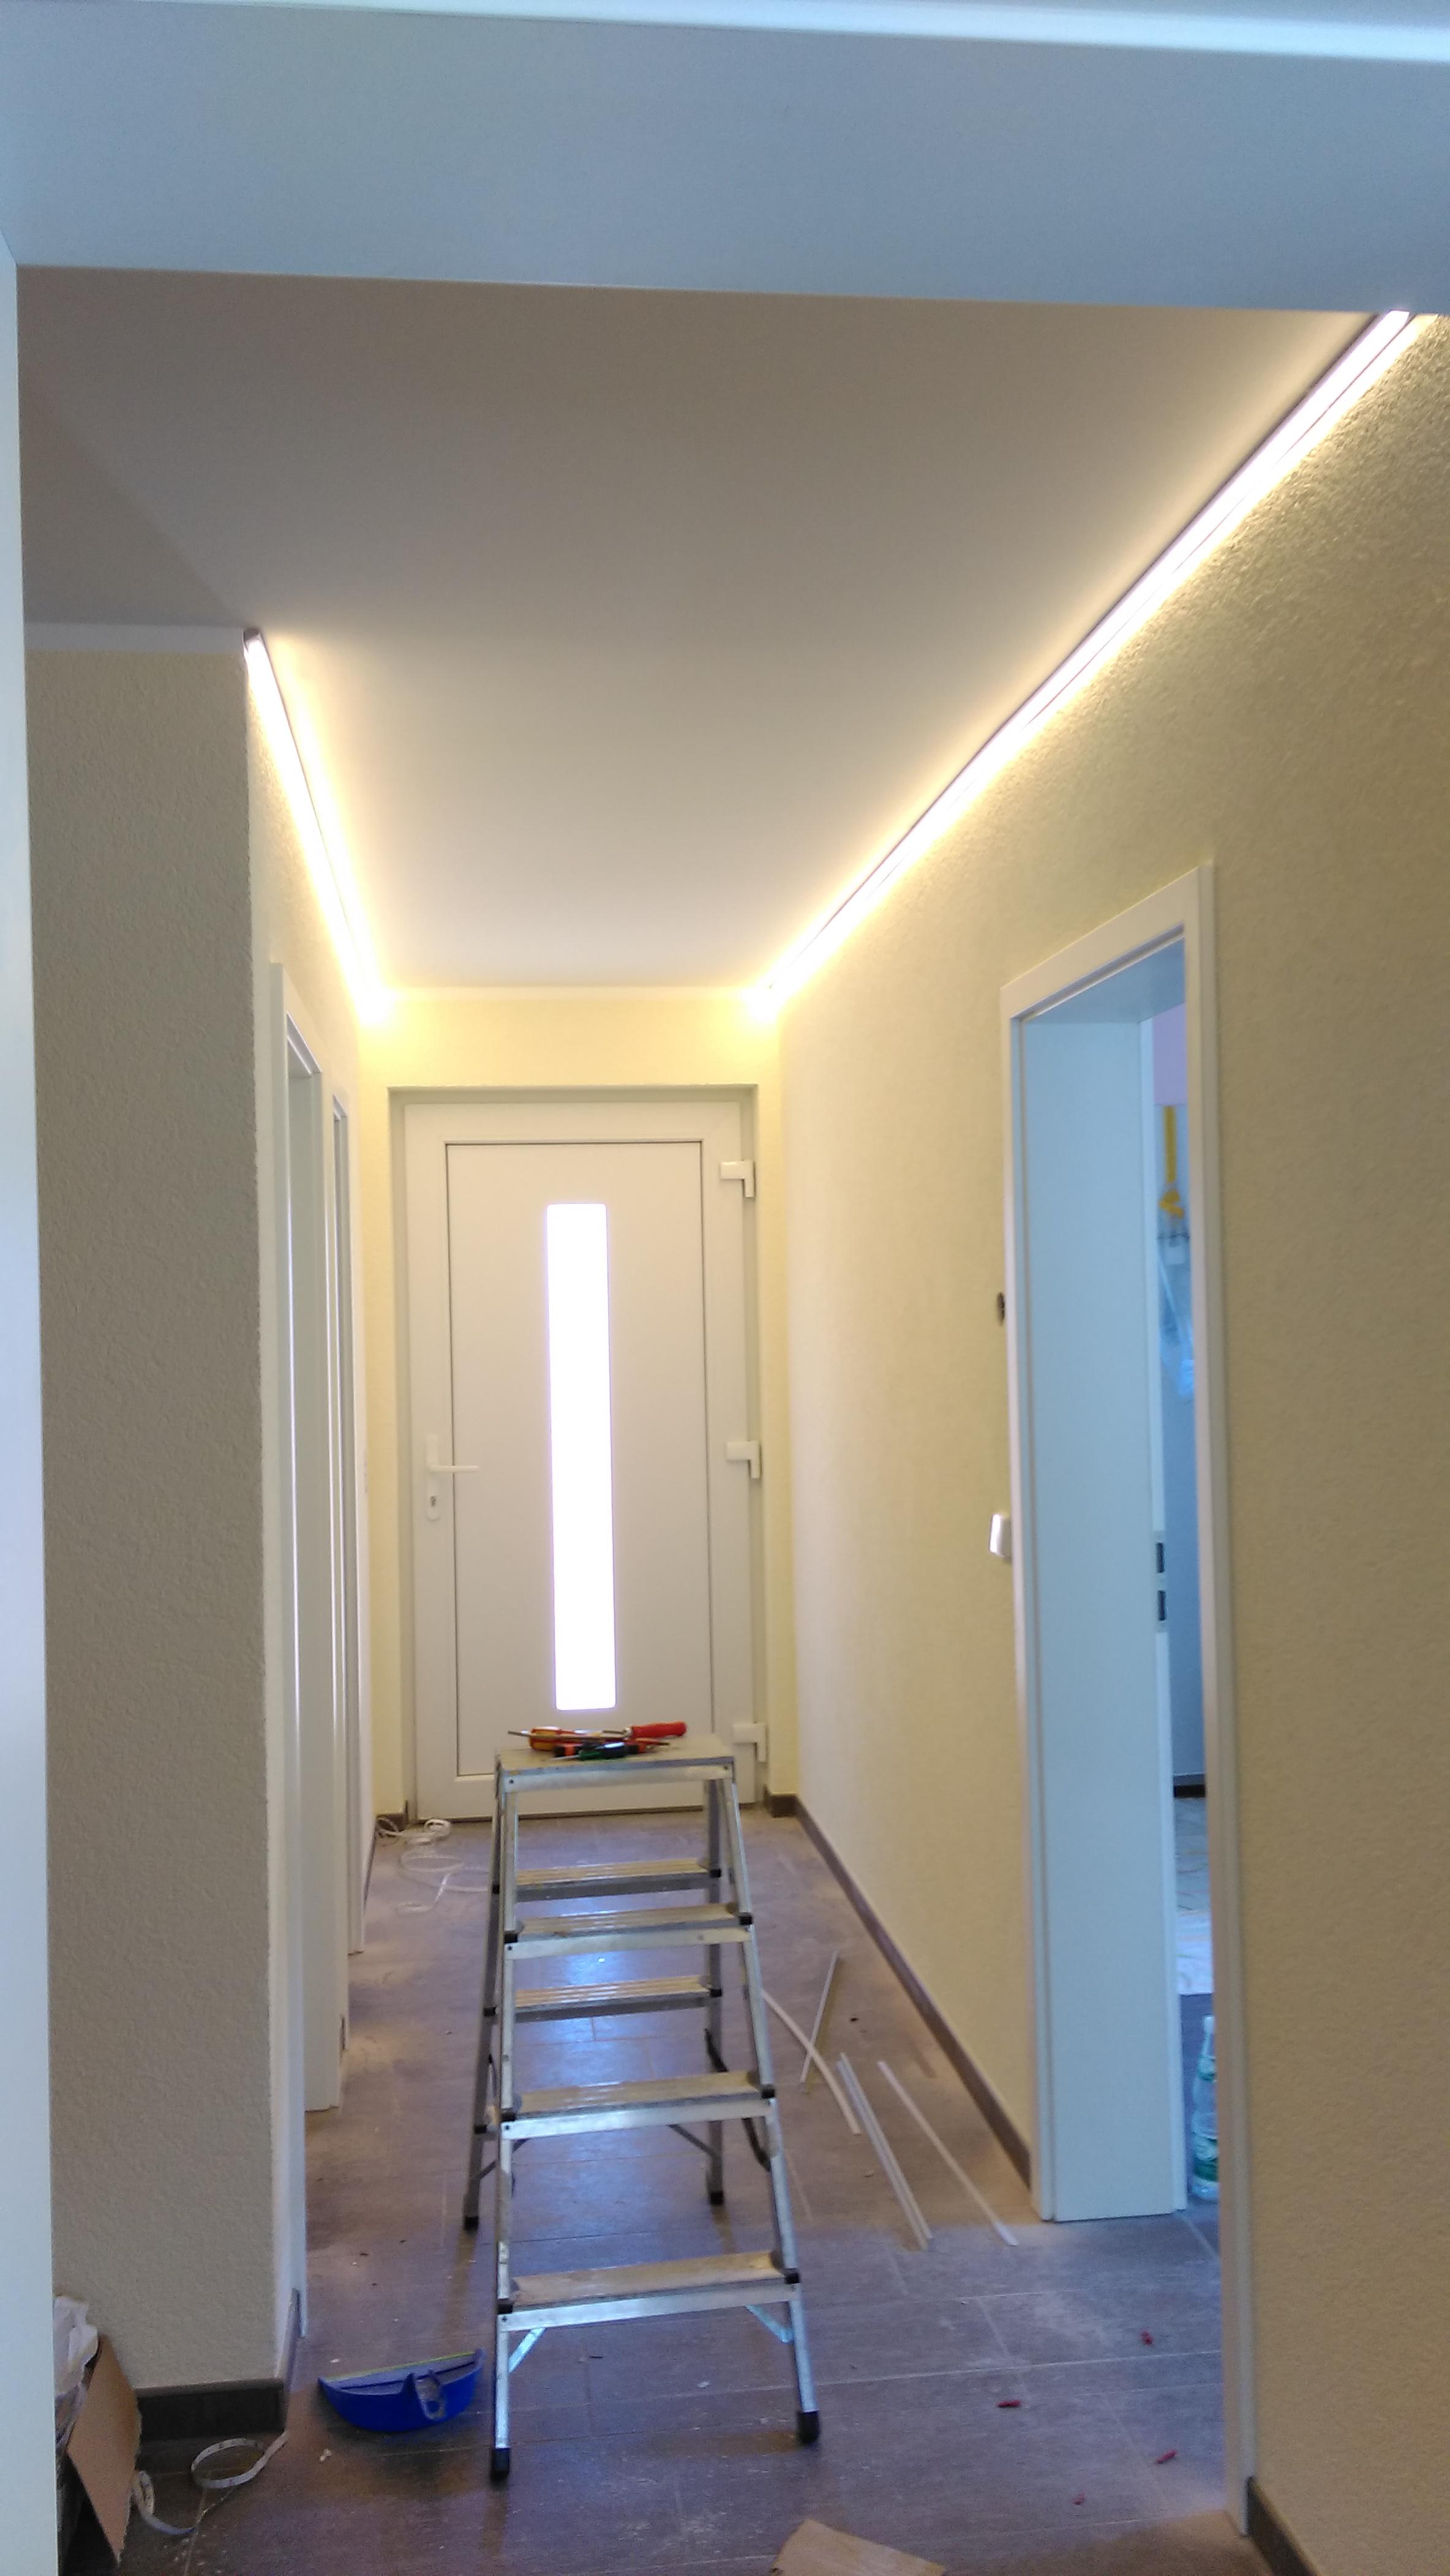 LED Flurbeleuchtung